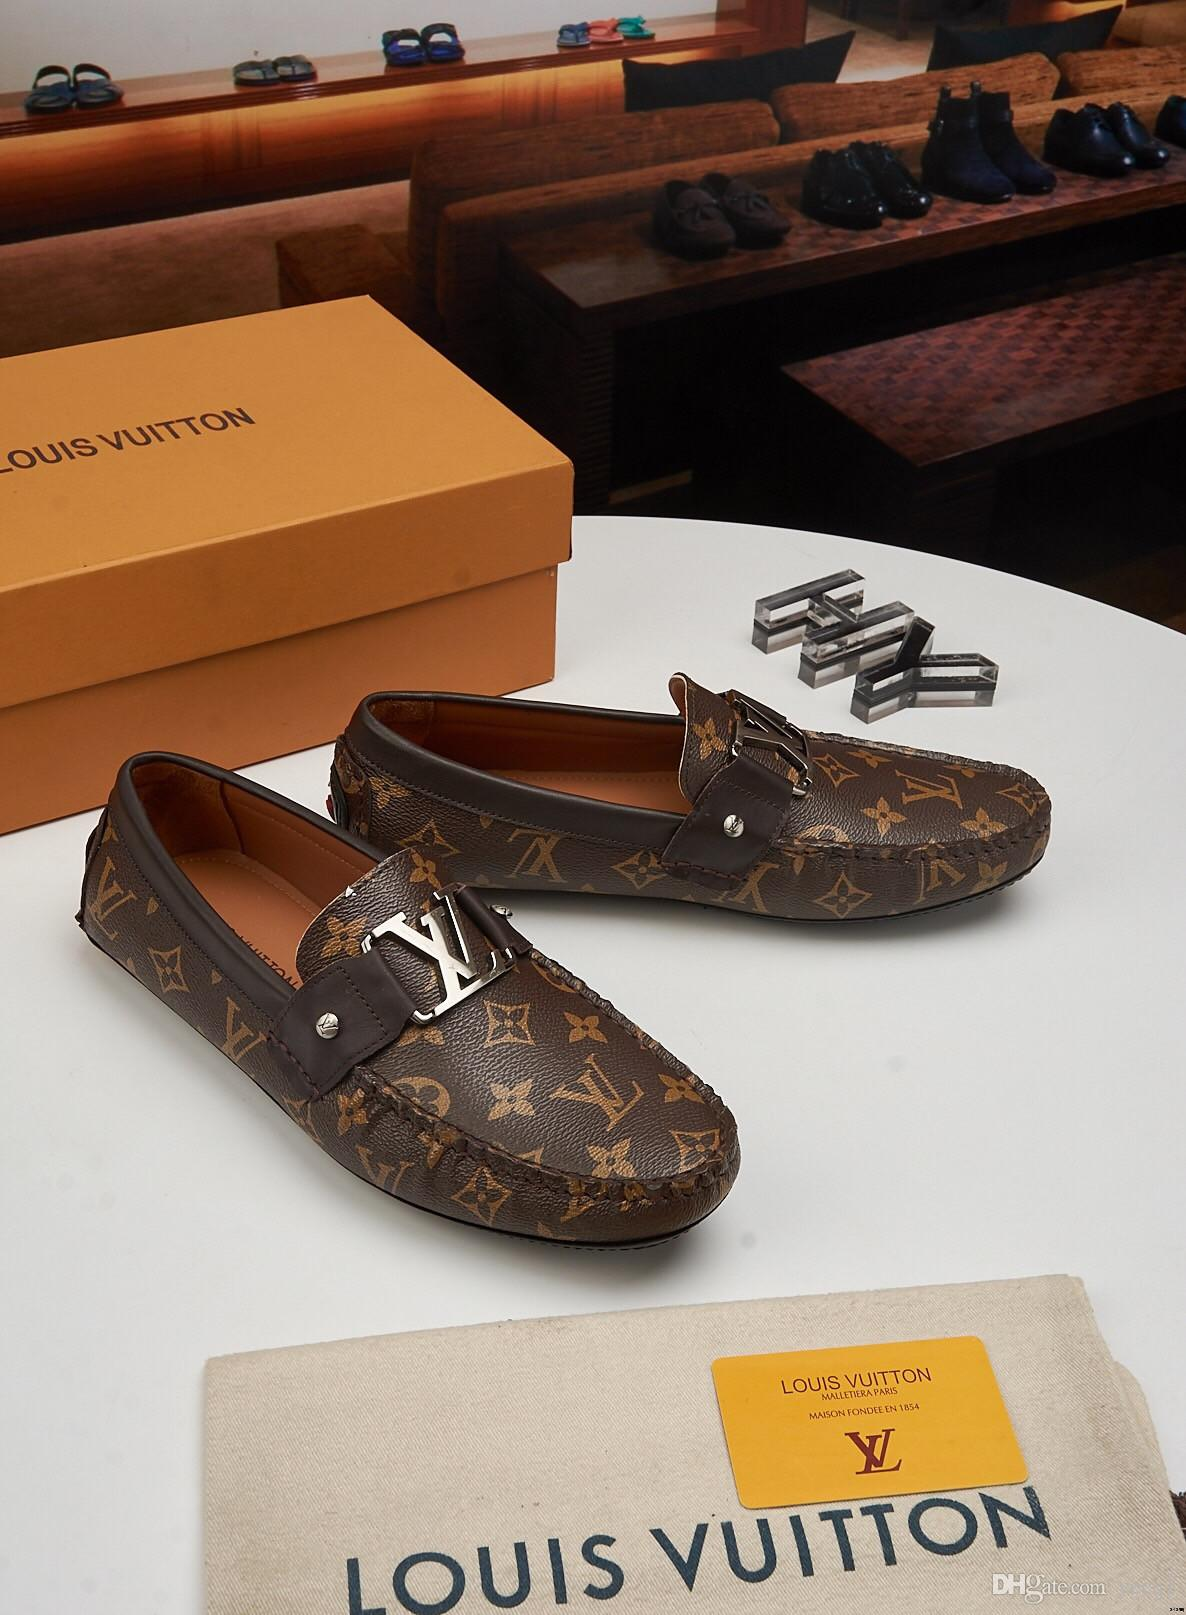 Hommes Chaussures 2018 NOUVEAU Hommes Mocassins Été 18ss Automne Hiver Chaussures Hommes Chaussures Bas Homme Casual Sapatos Tenis Masculino